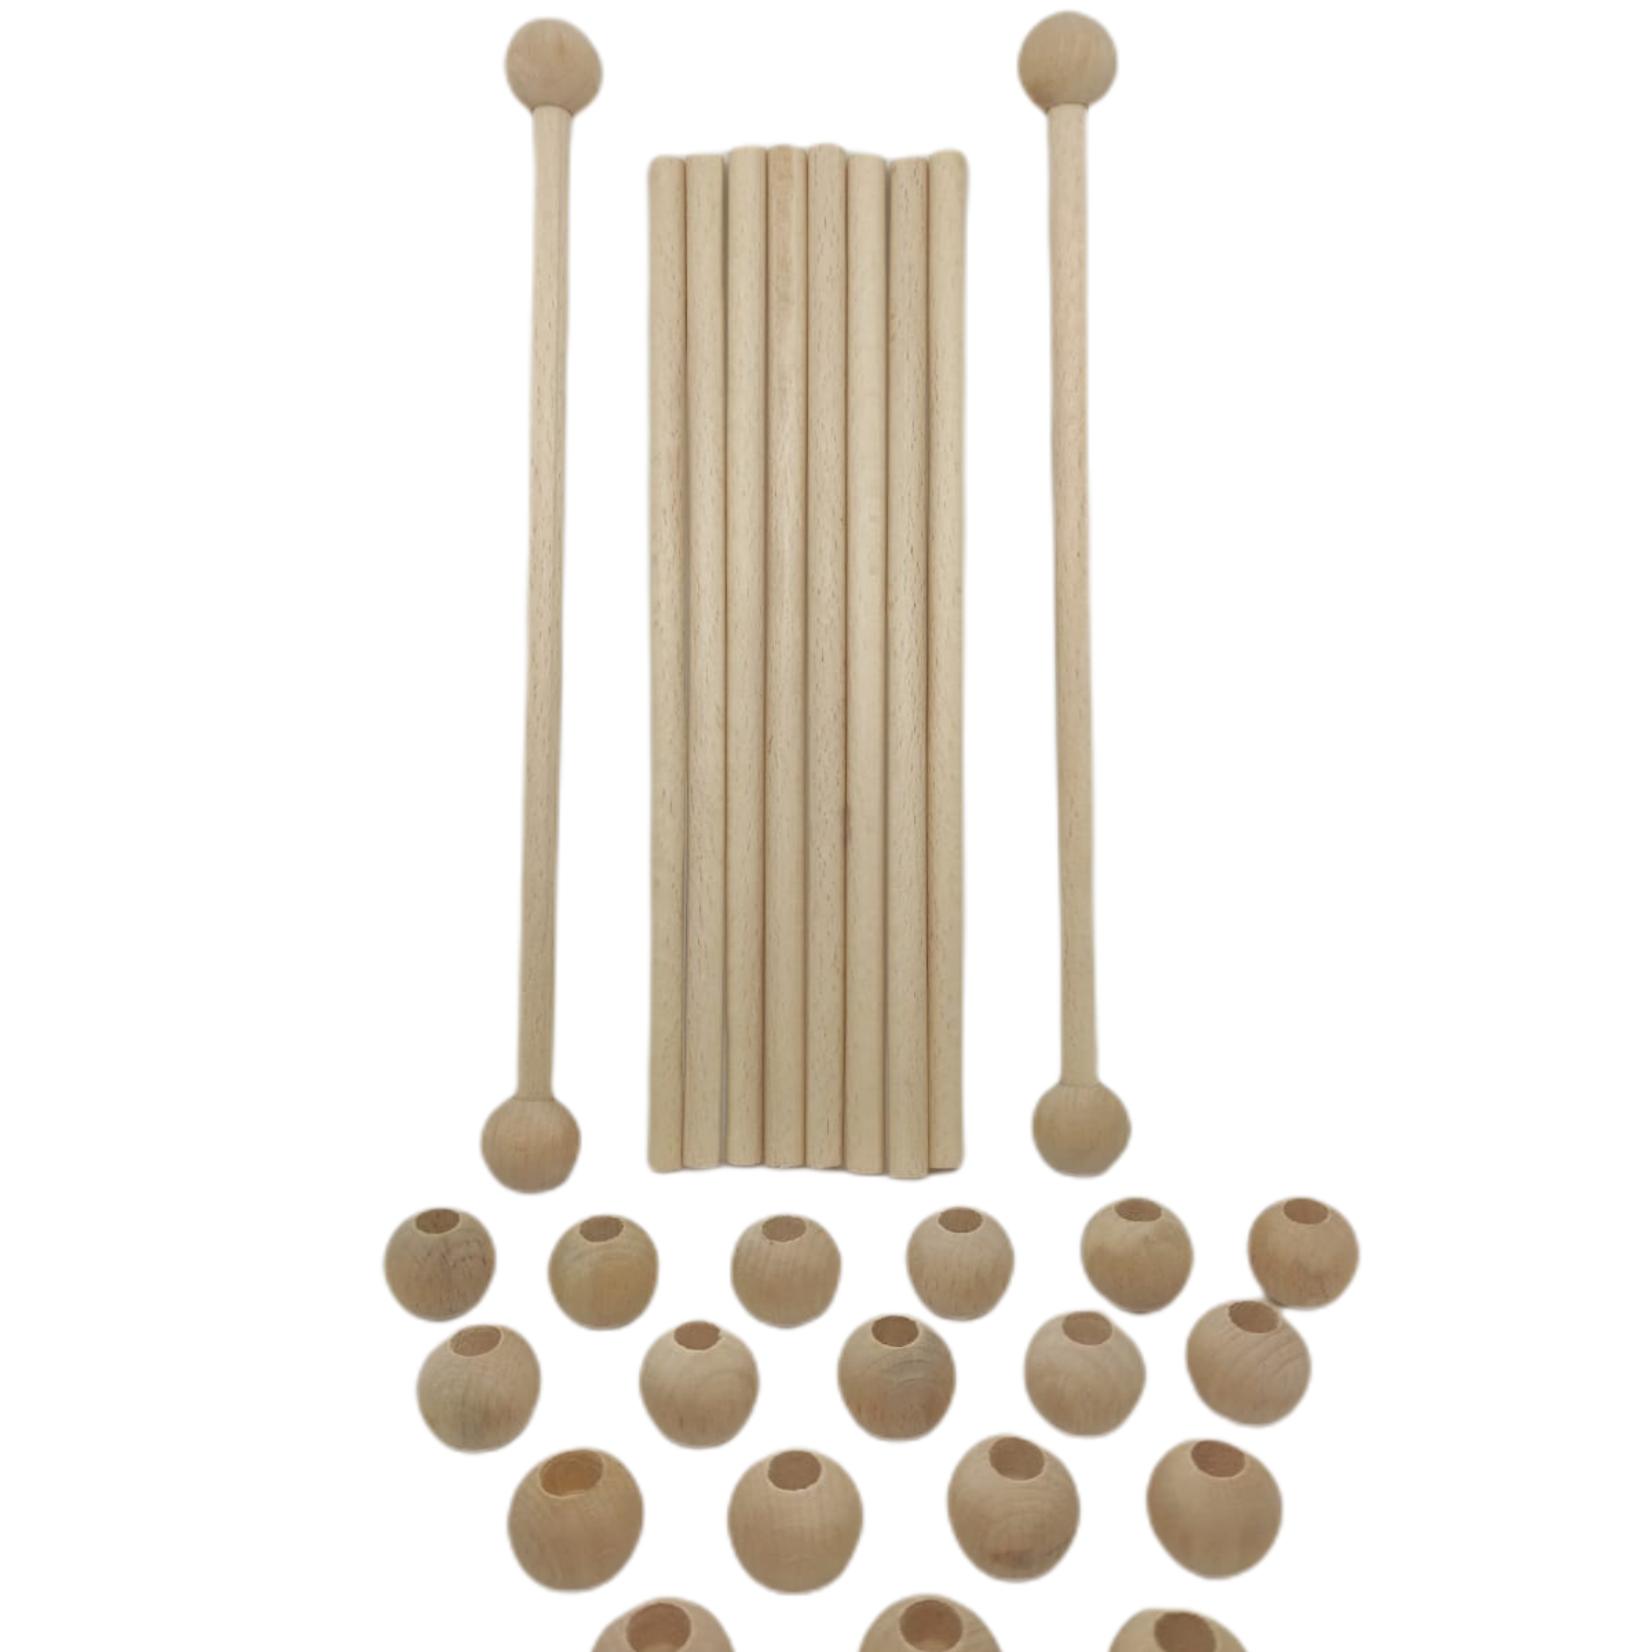 4 blankhouten stokken á 50cm